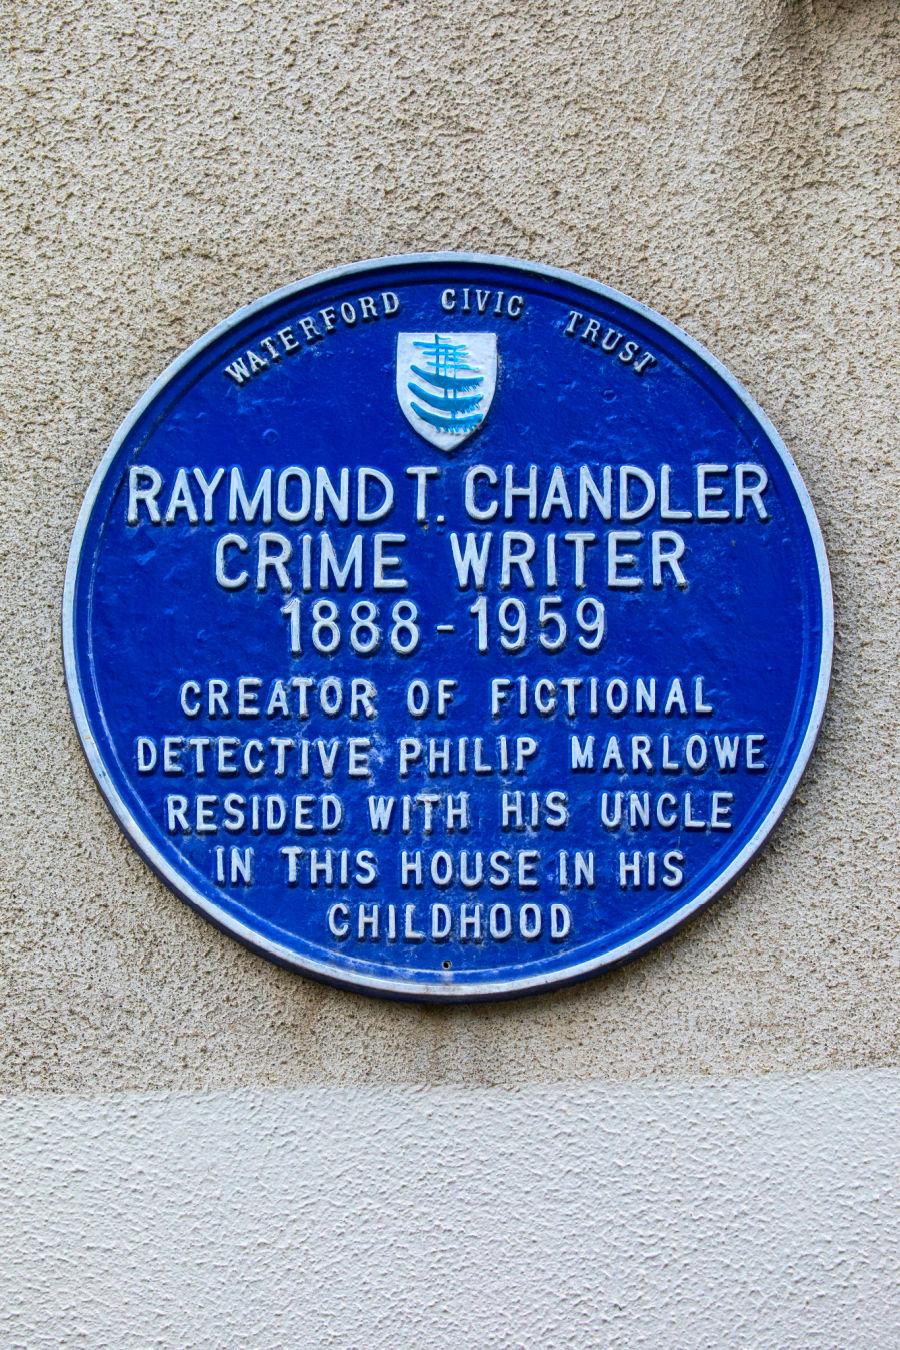 Photo of plaque of Raymond Chandler